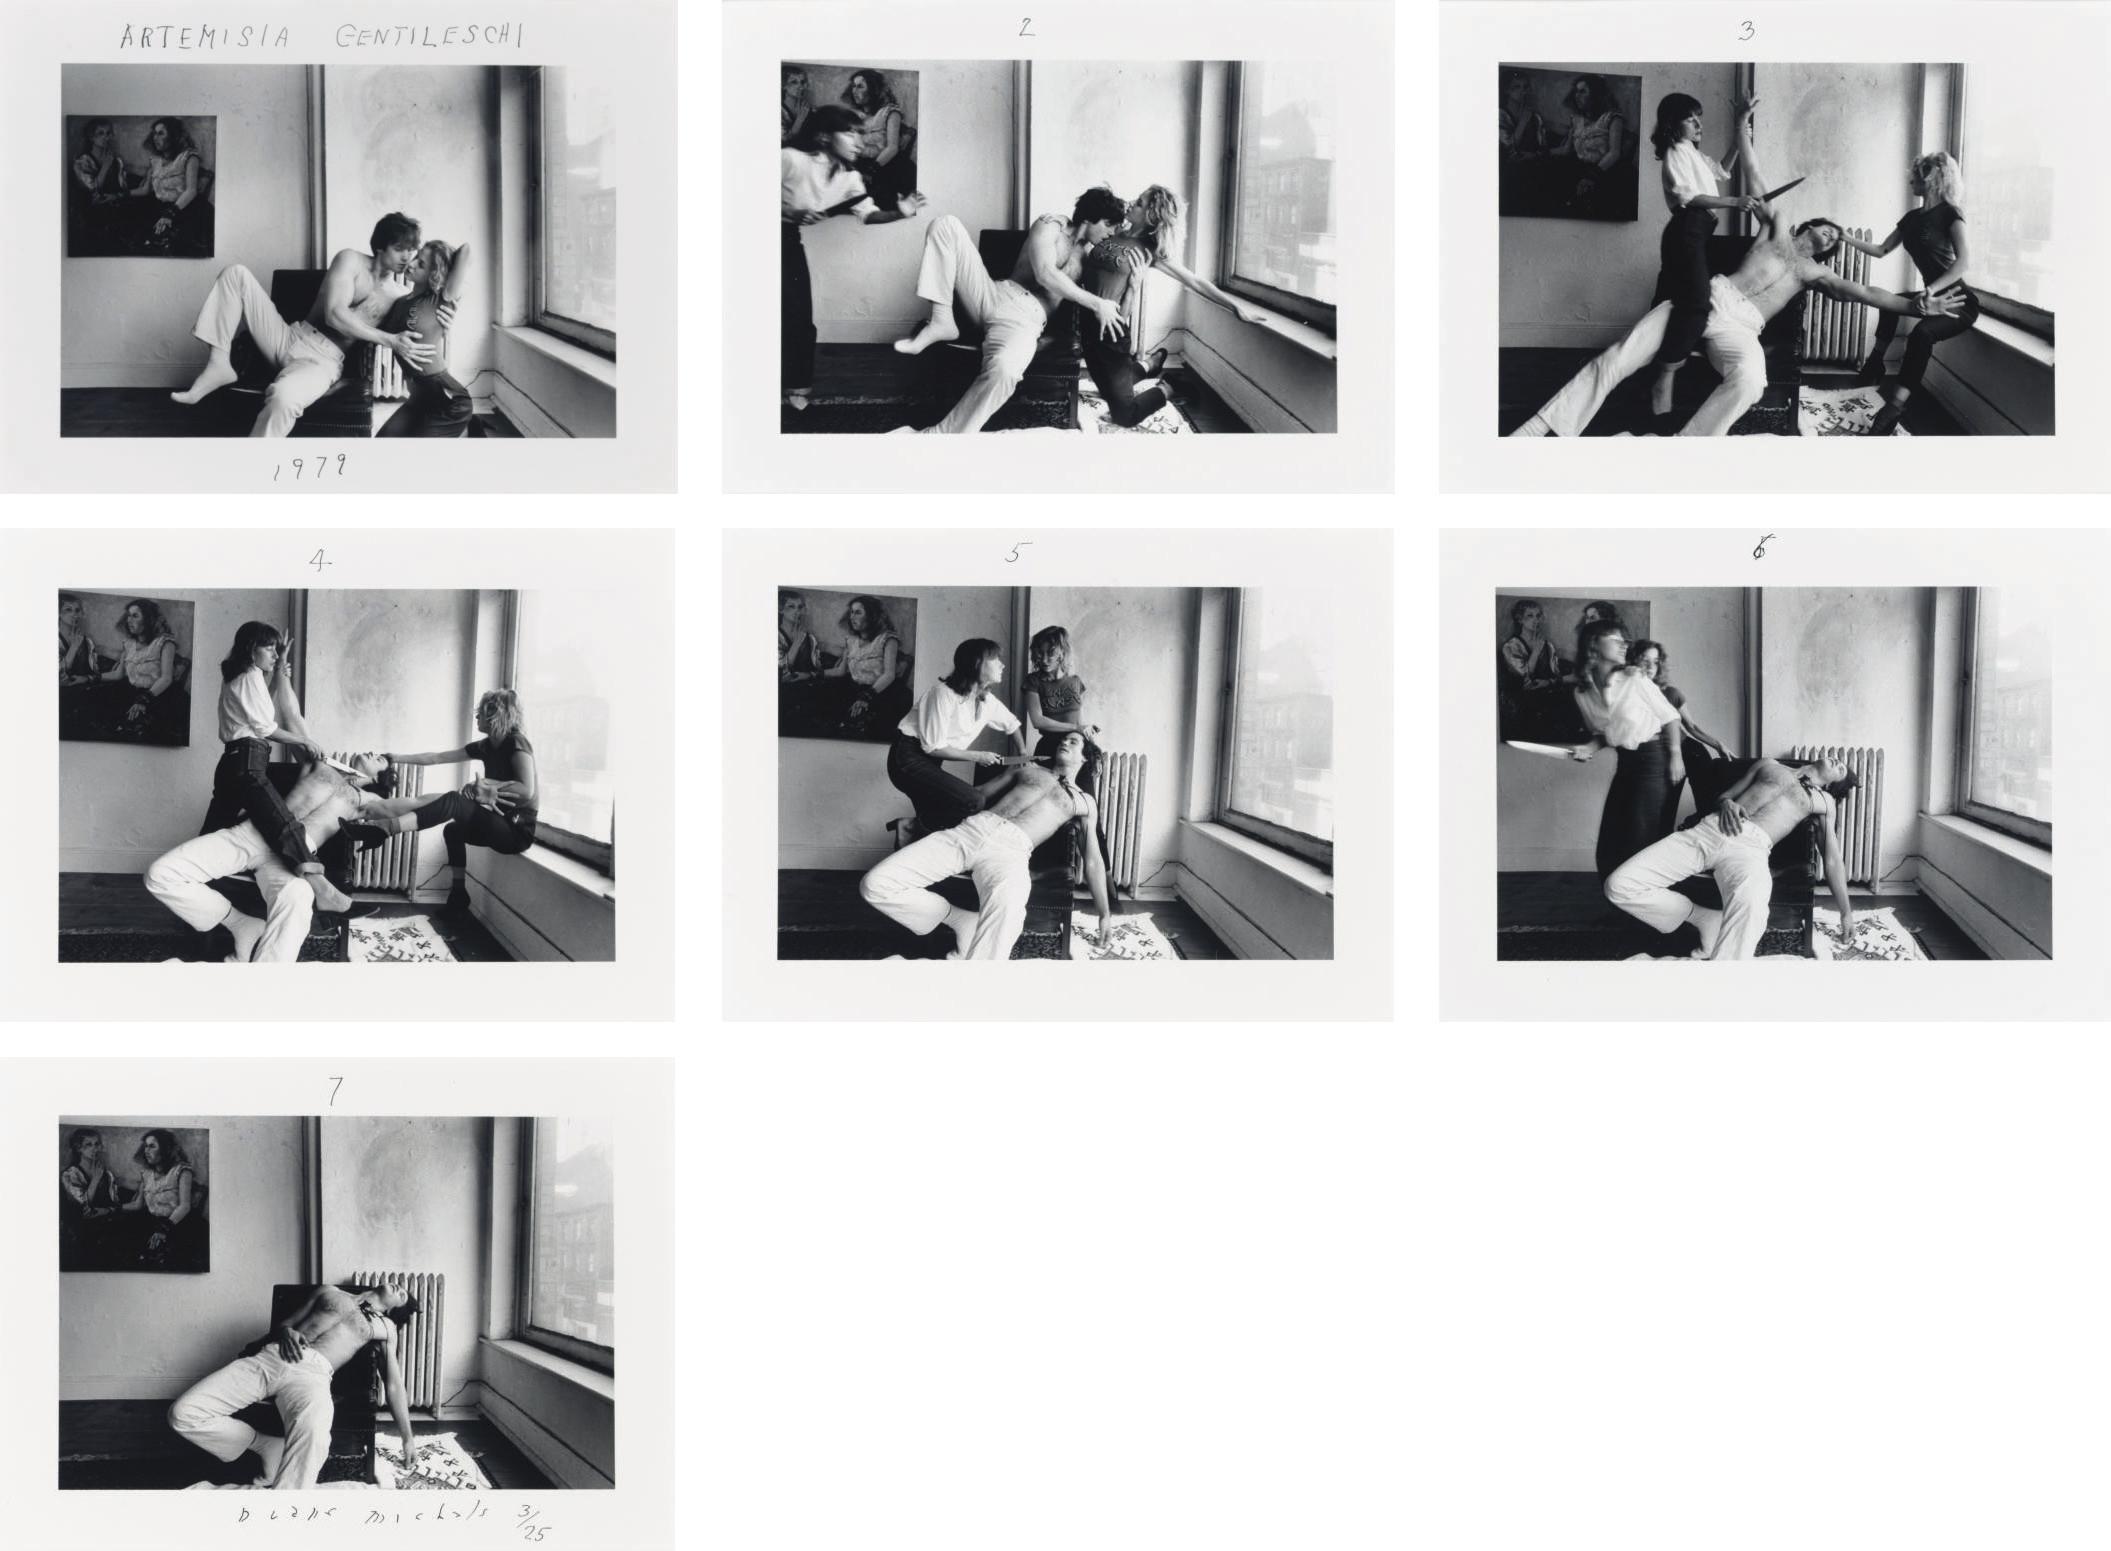 Artemisia Gentileschi, 1979